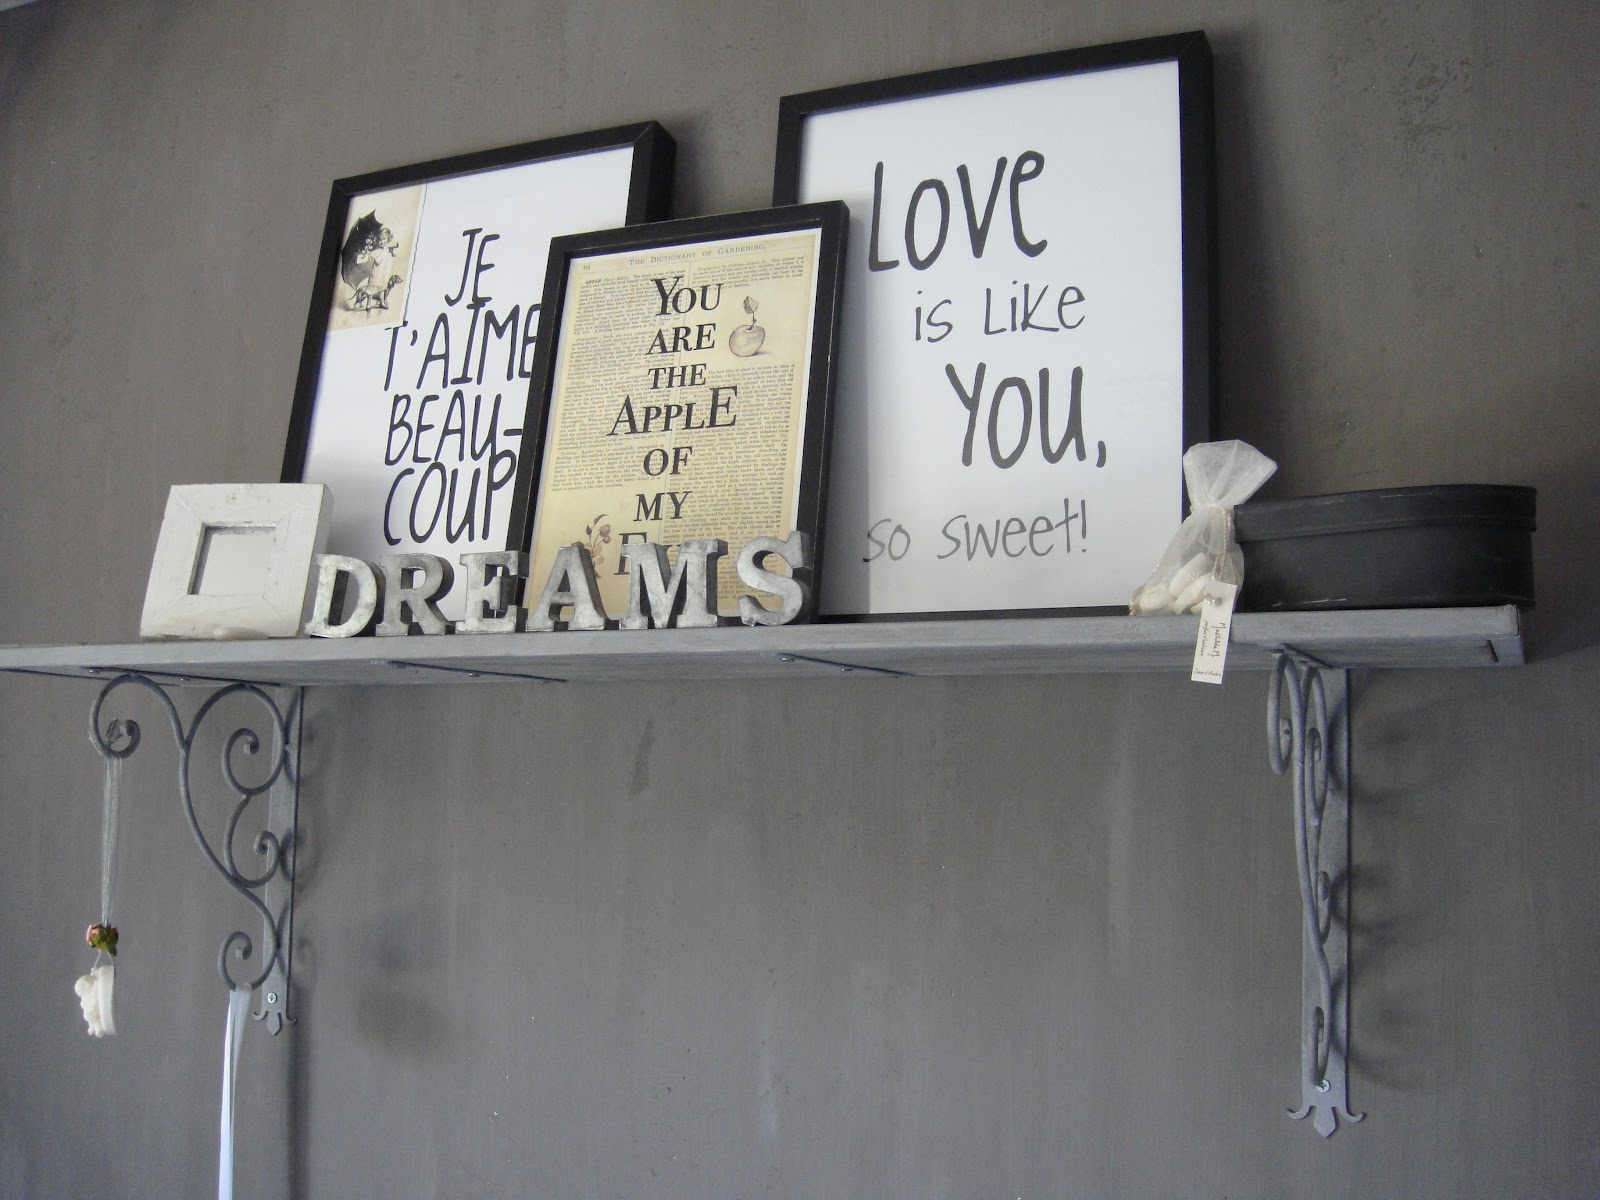 Mooi Slaapkamer Idees : Slaapkamer ideeën mooi idee voor aan de muur ...